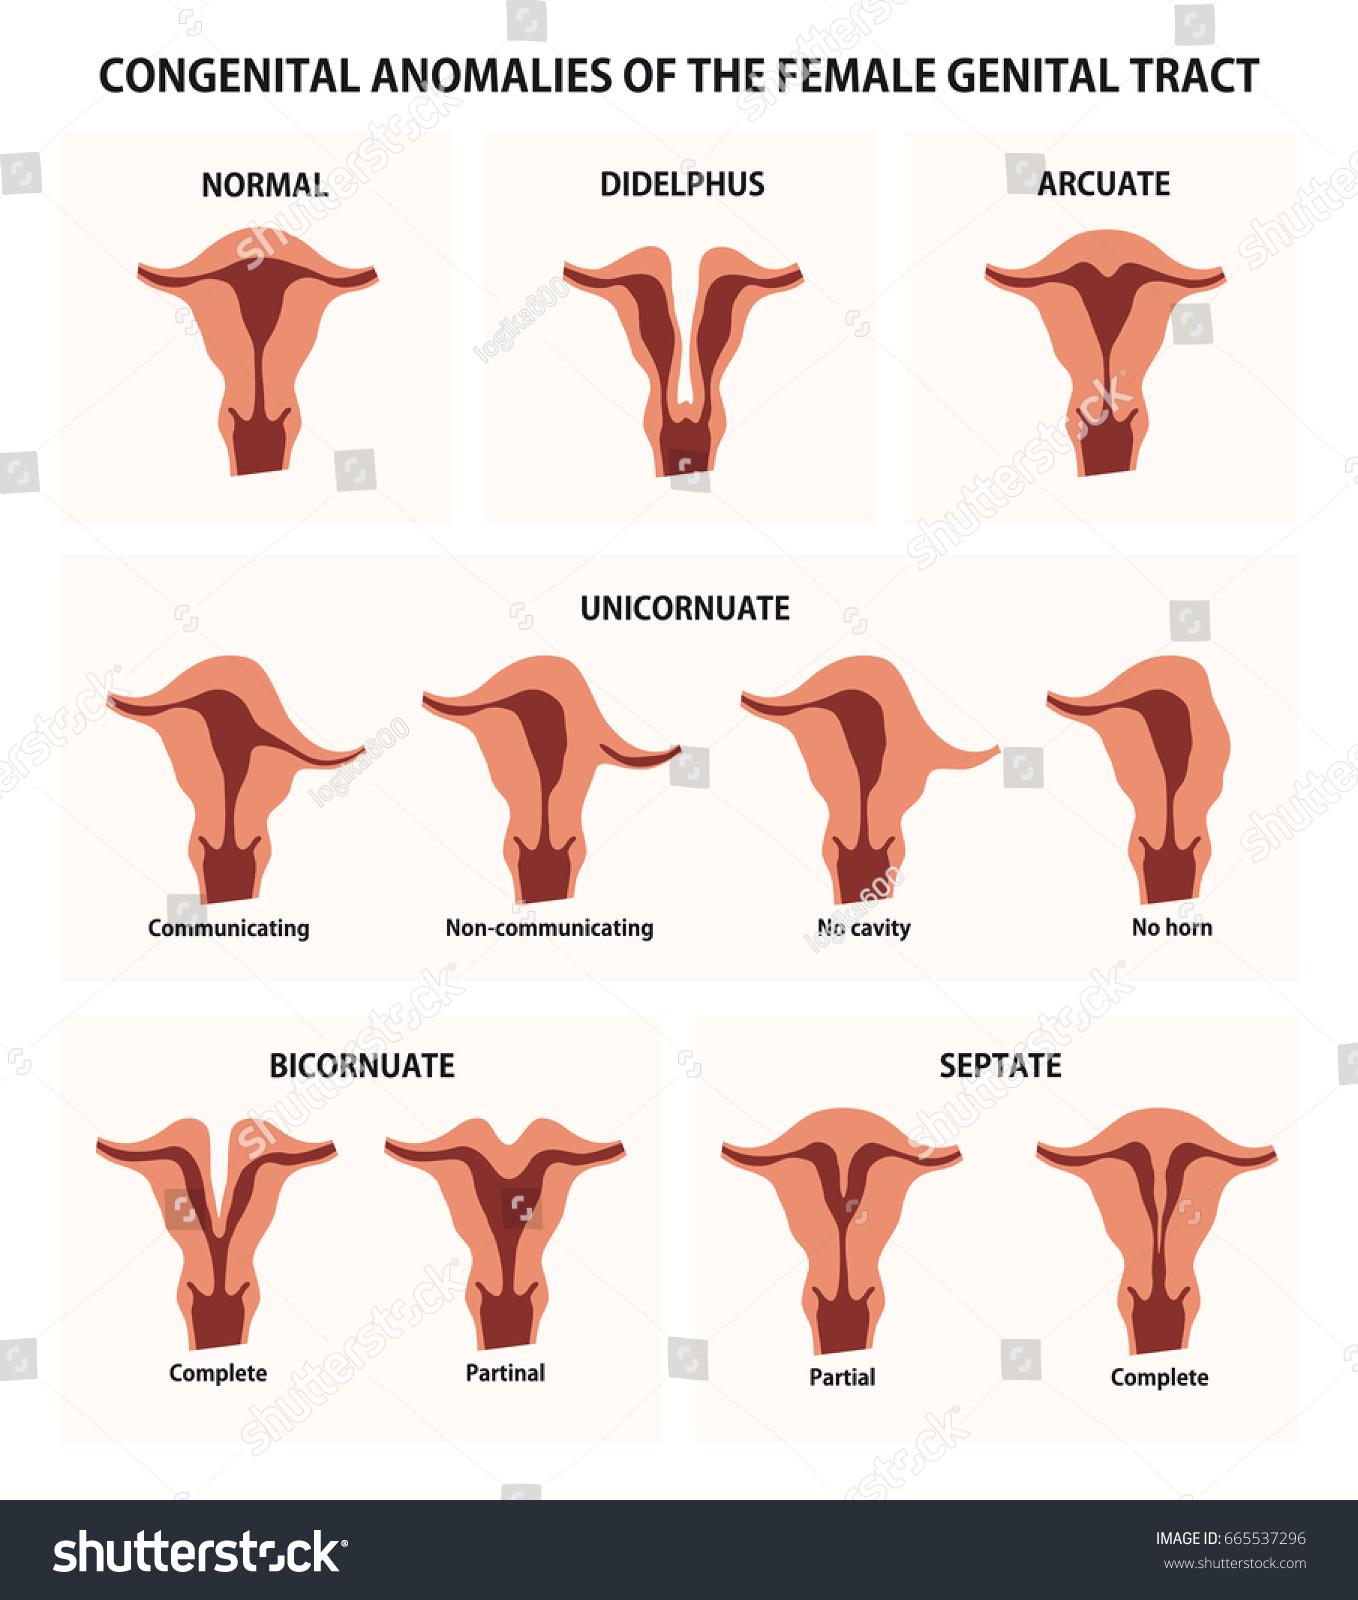 Congenital Anomalies Female Genital Tract Stock Vector 665537296 ...